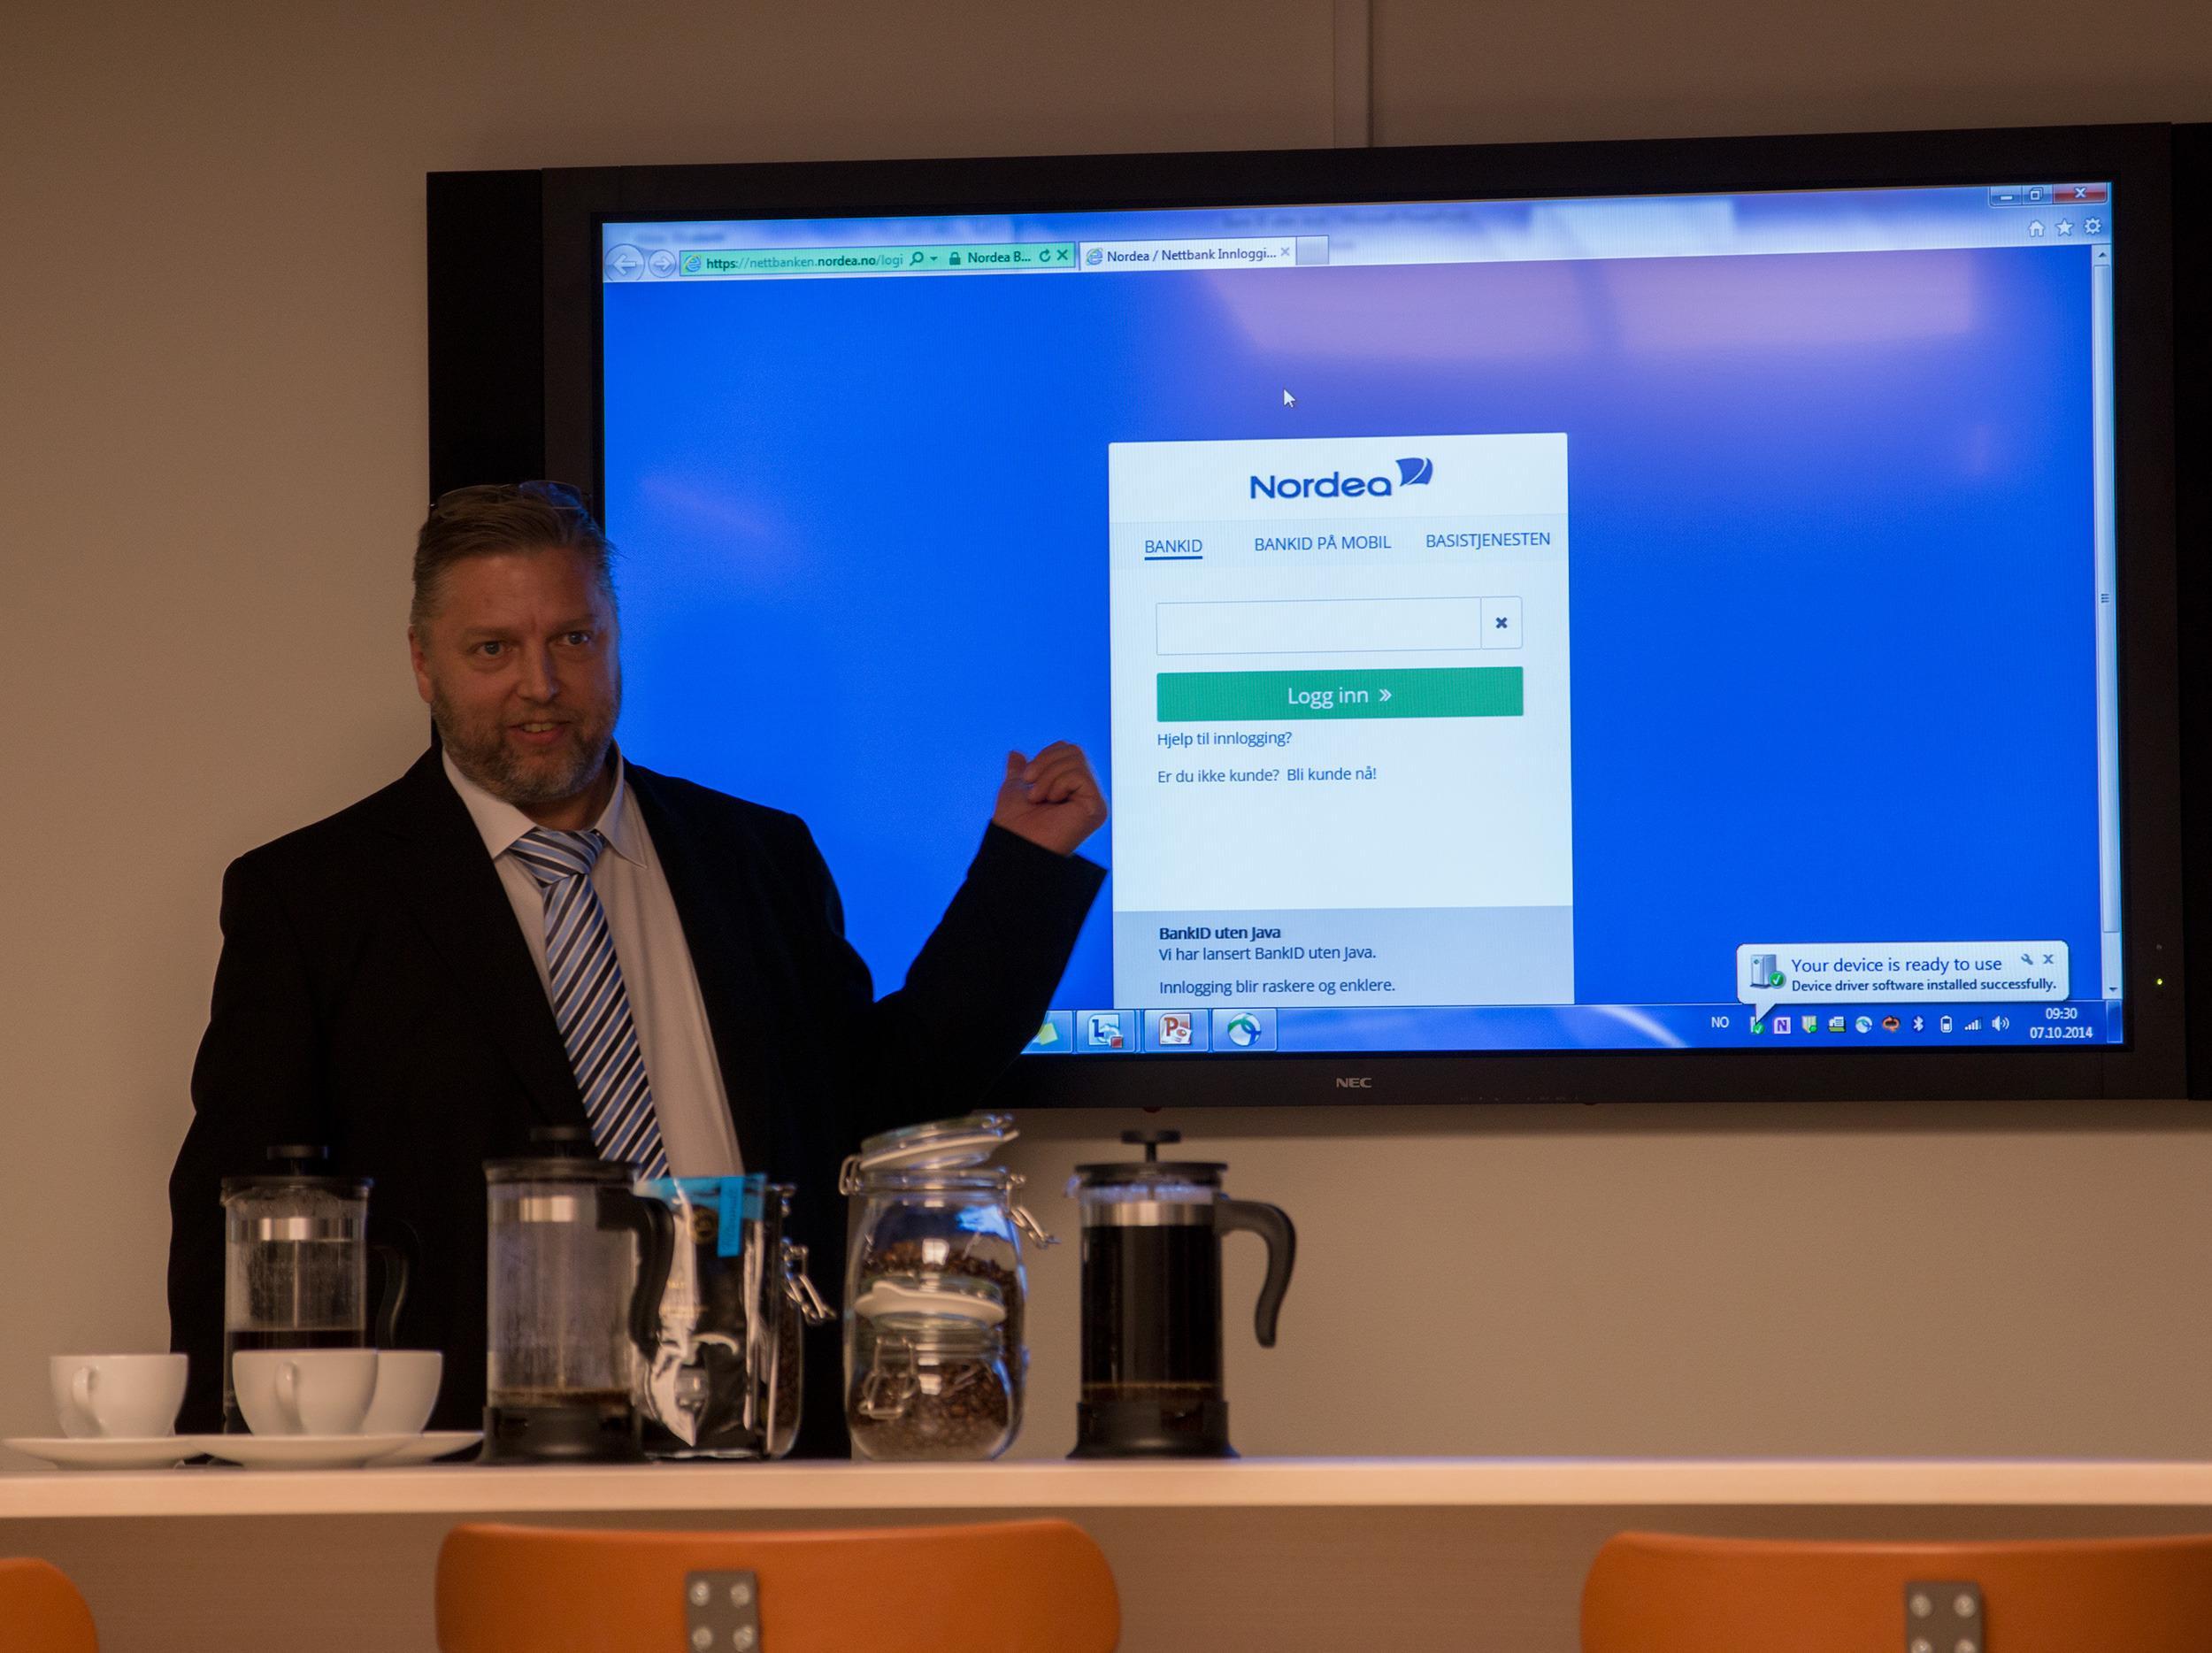 Steinar Birkeland i Nordea demonstrerer den nye Java-frie bank-innloggingen.Foto: Anders Brattensborg Smedsrud, Tek.no